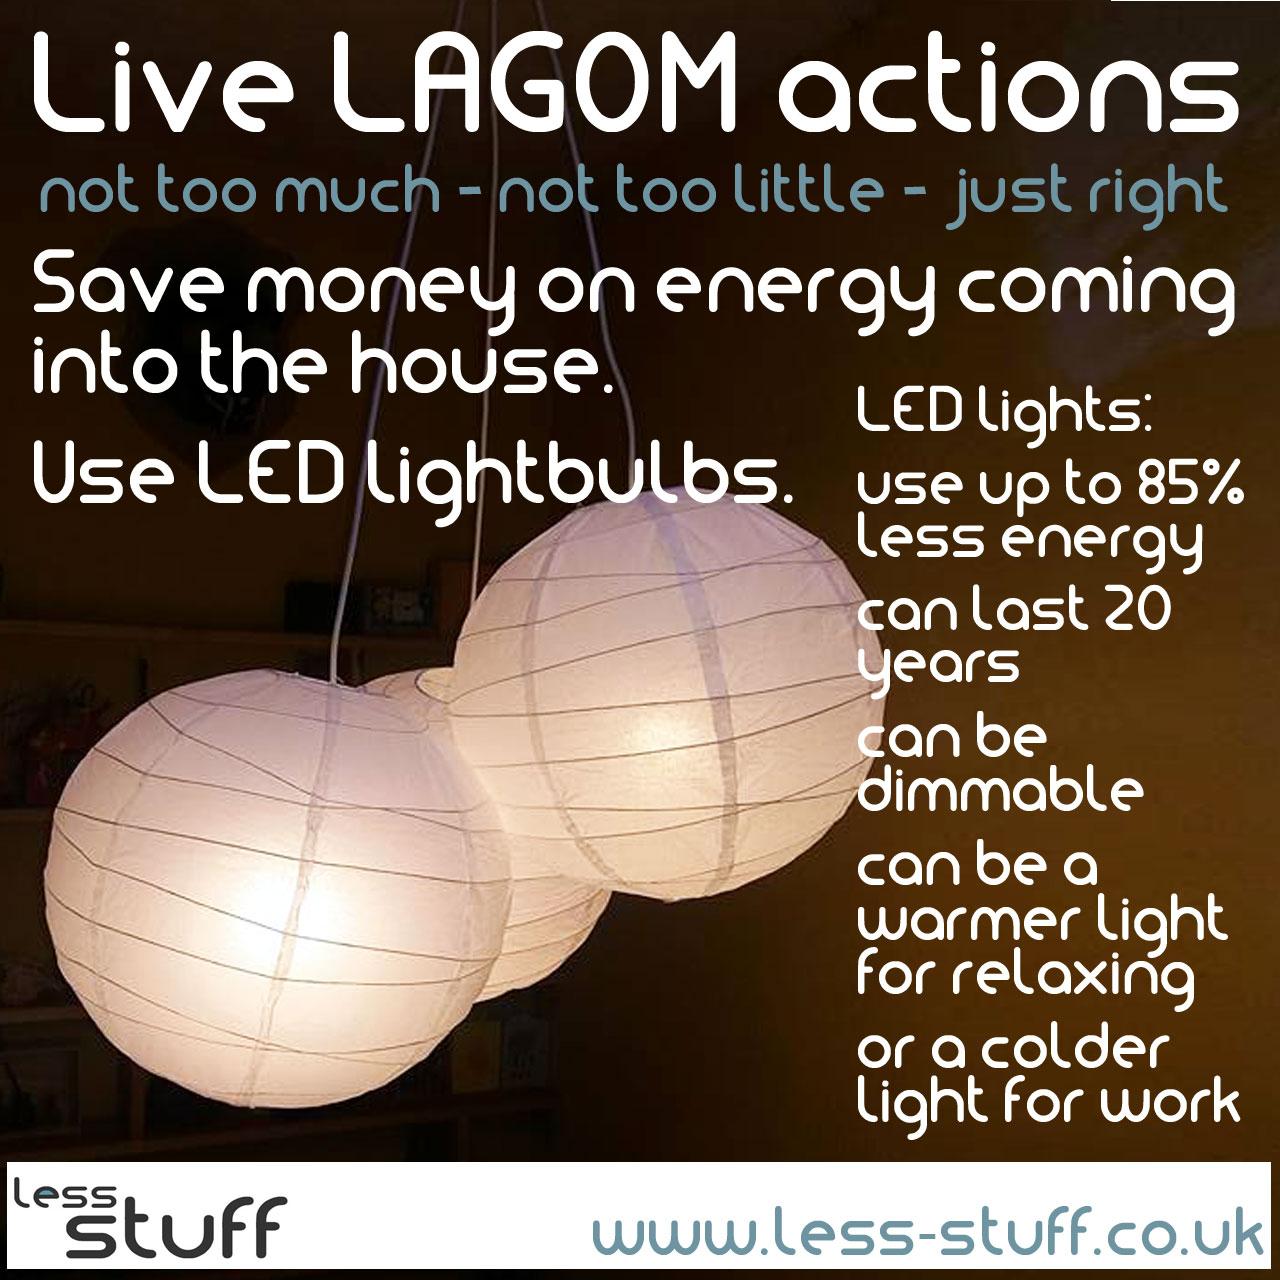 live lagom led lightbulbs save money